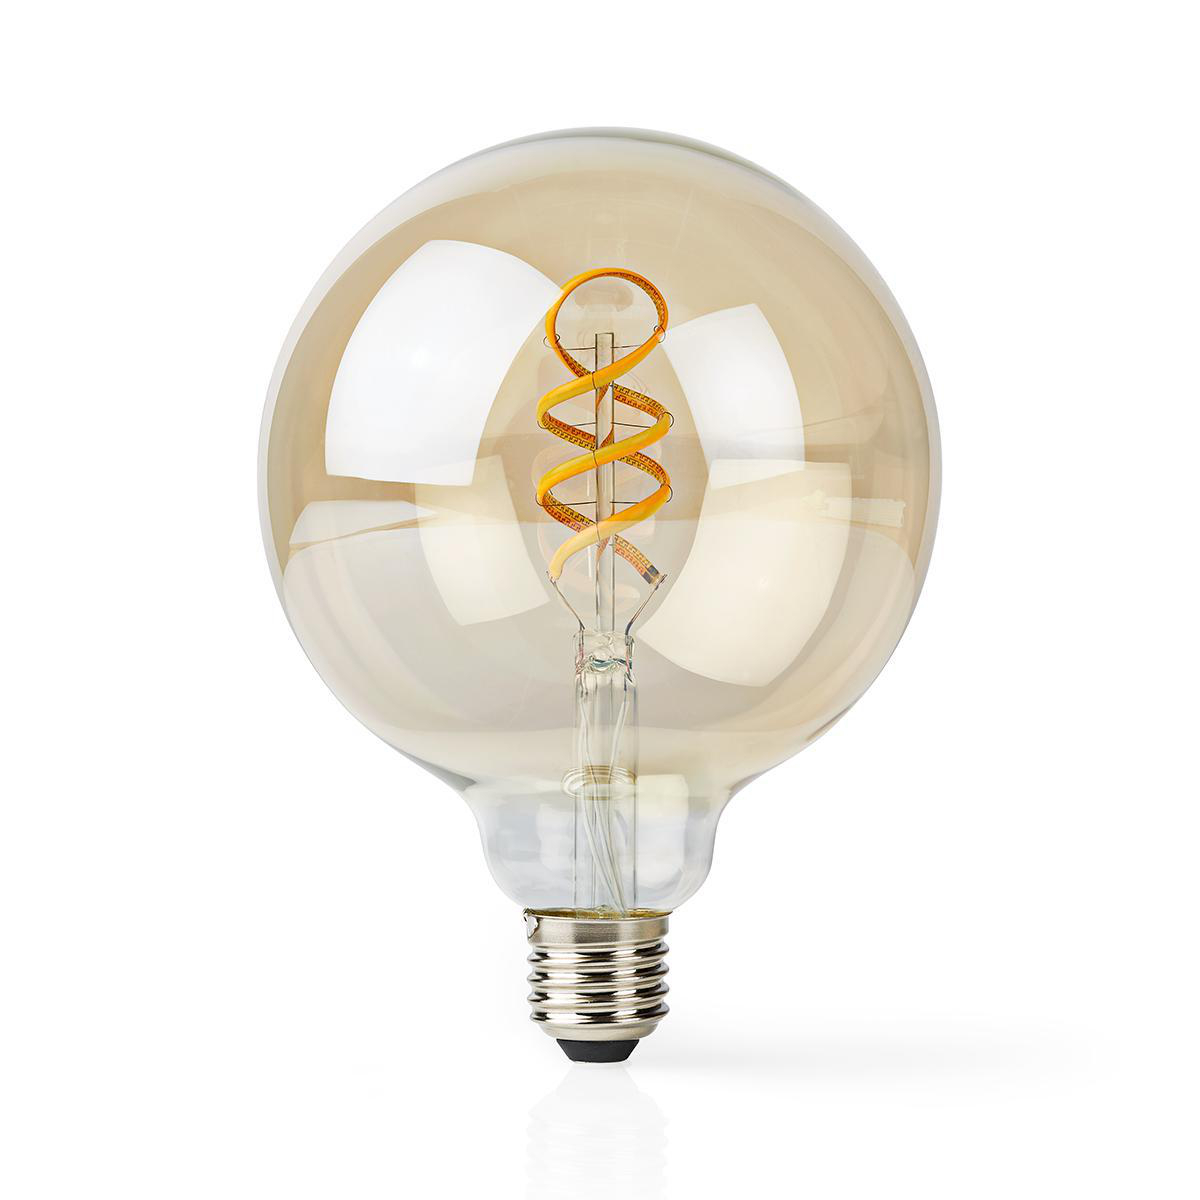 Globe spiraal lamp G125 - 125mm - LED slimme lamp - Amber - dimbaar - app besturing - filament - voorkant